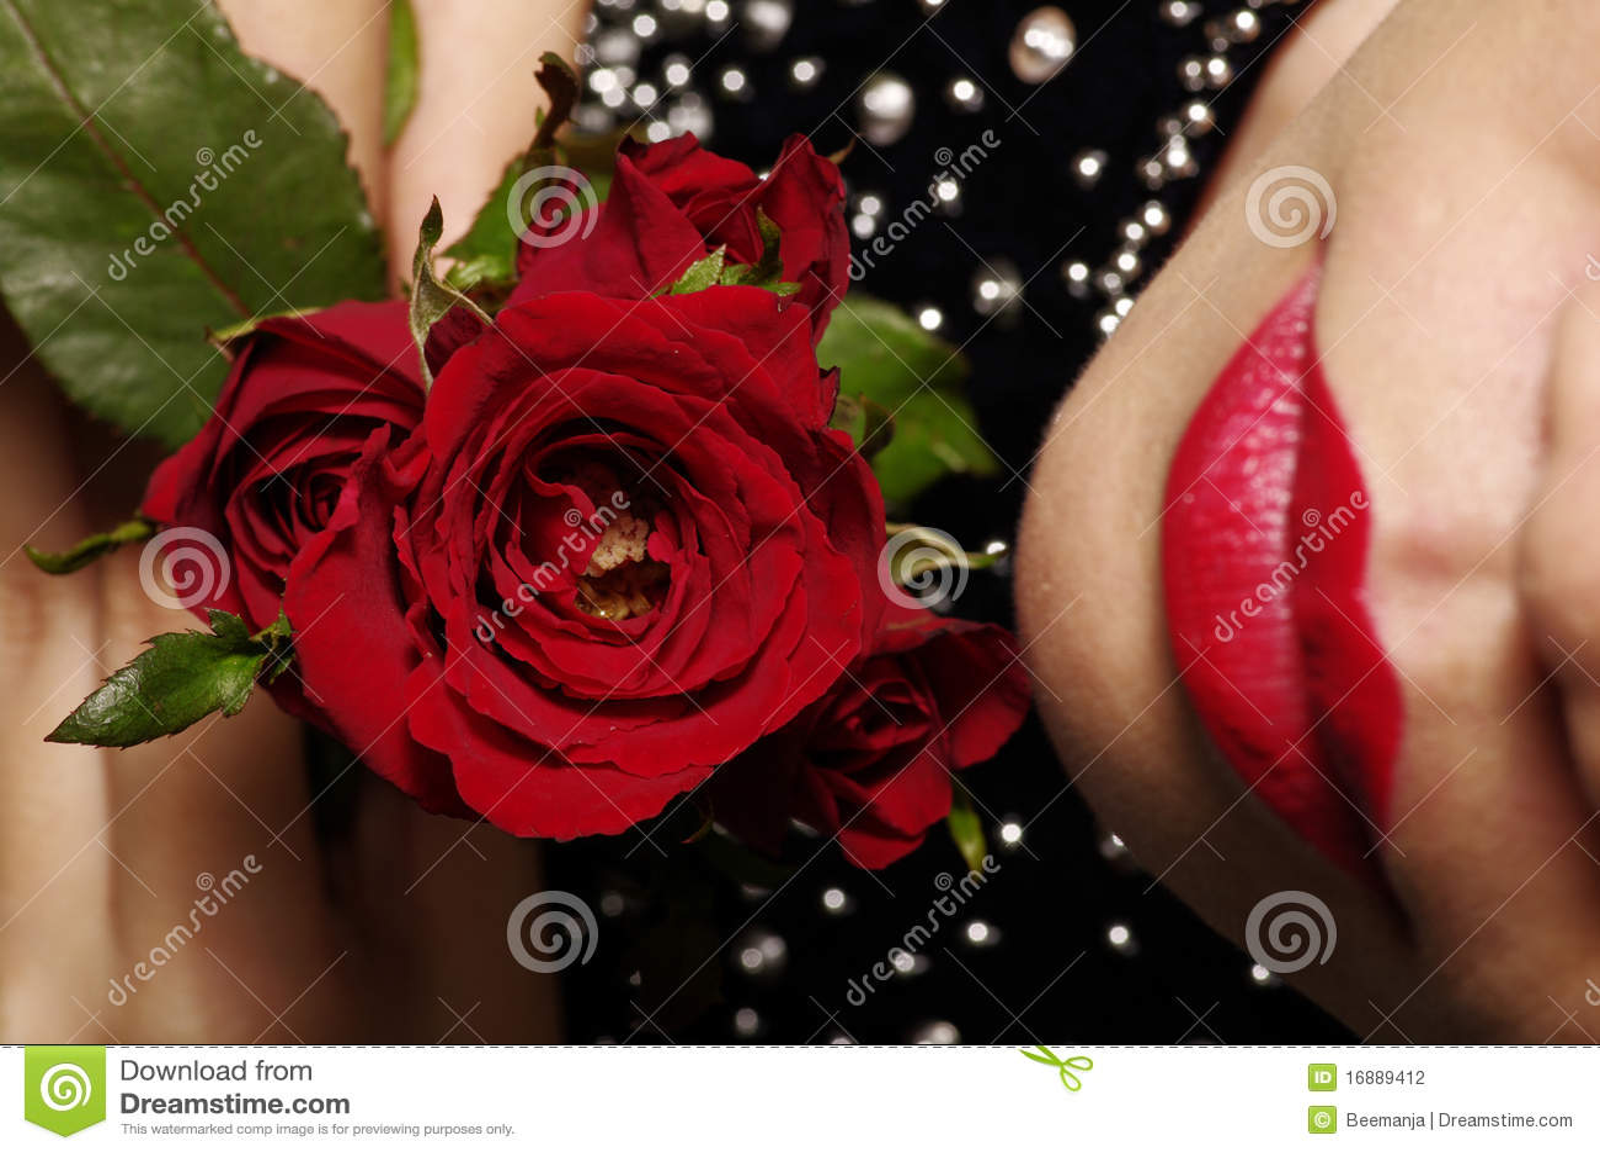 mujer y rosa roja - photo #4